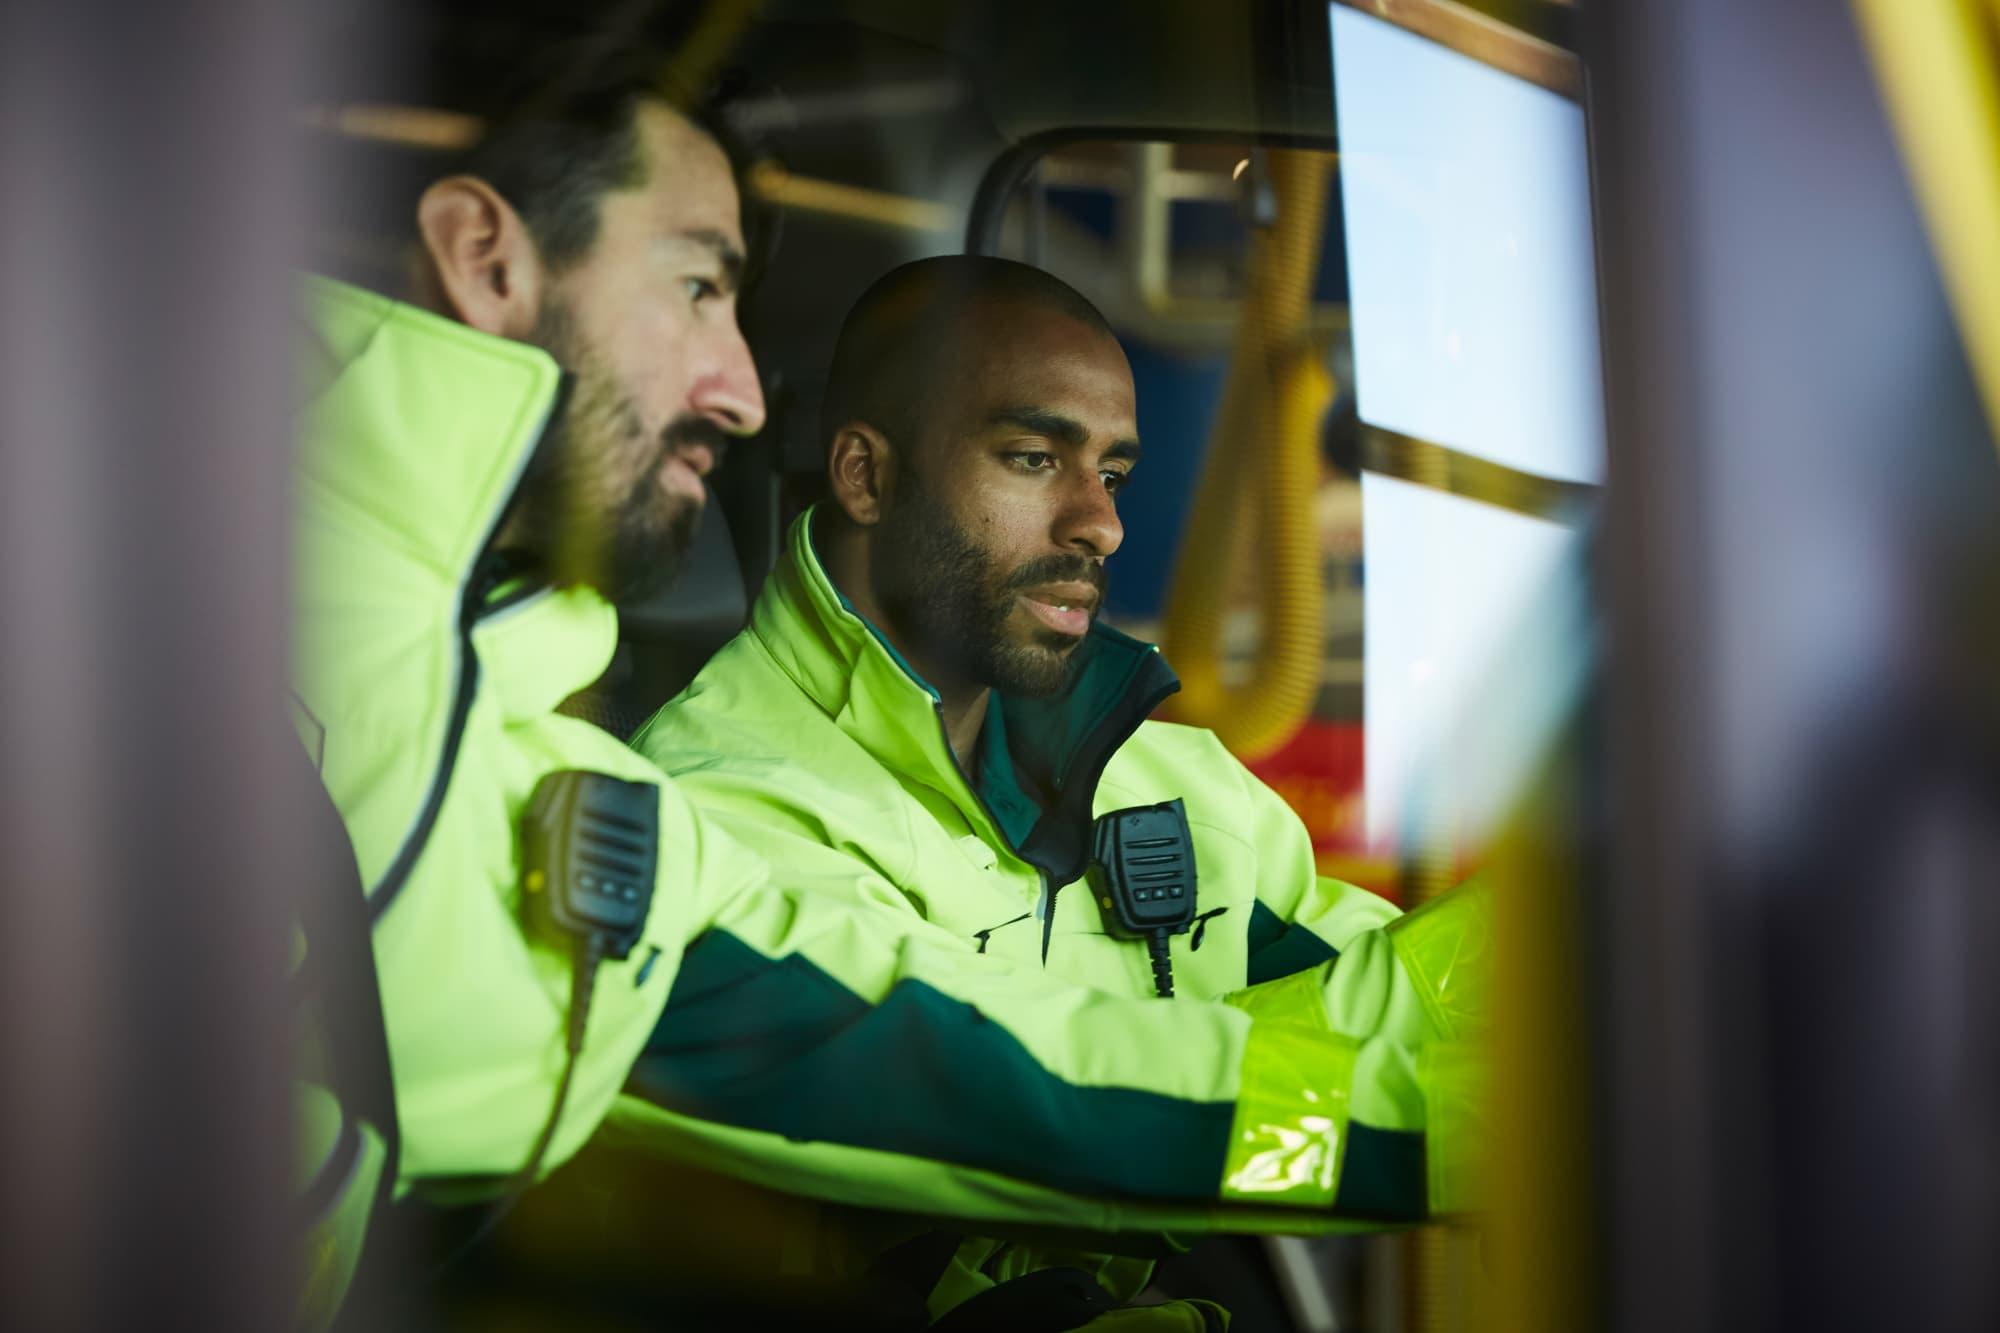 How to Become a Paramedic/EMT: Paramedic Schools and EMT Training